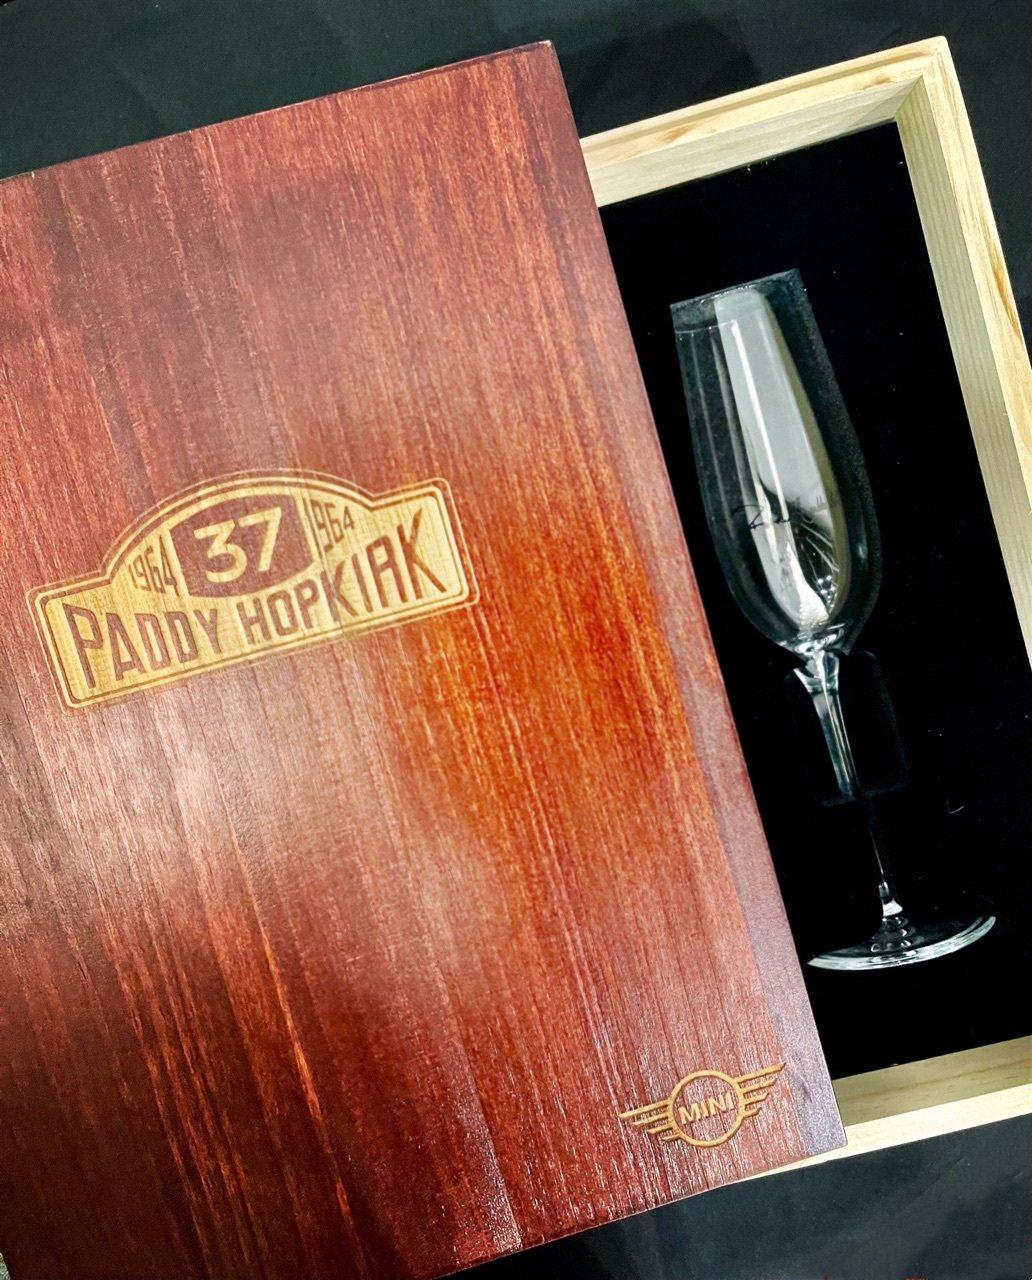 MINI與Paddy Hopkirk聯名〈MINI冠軍香檳杯組〉(一組兩個),僅...